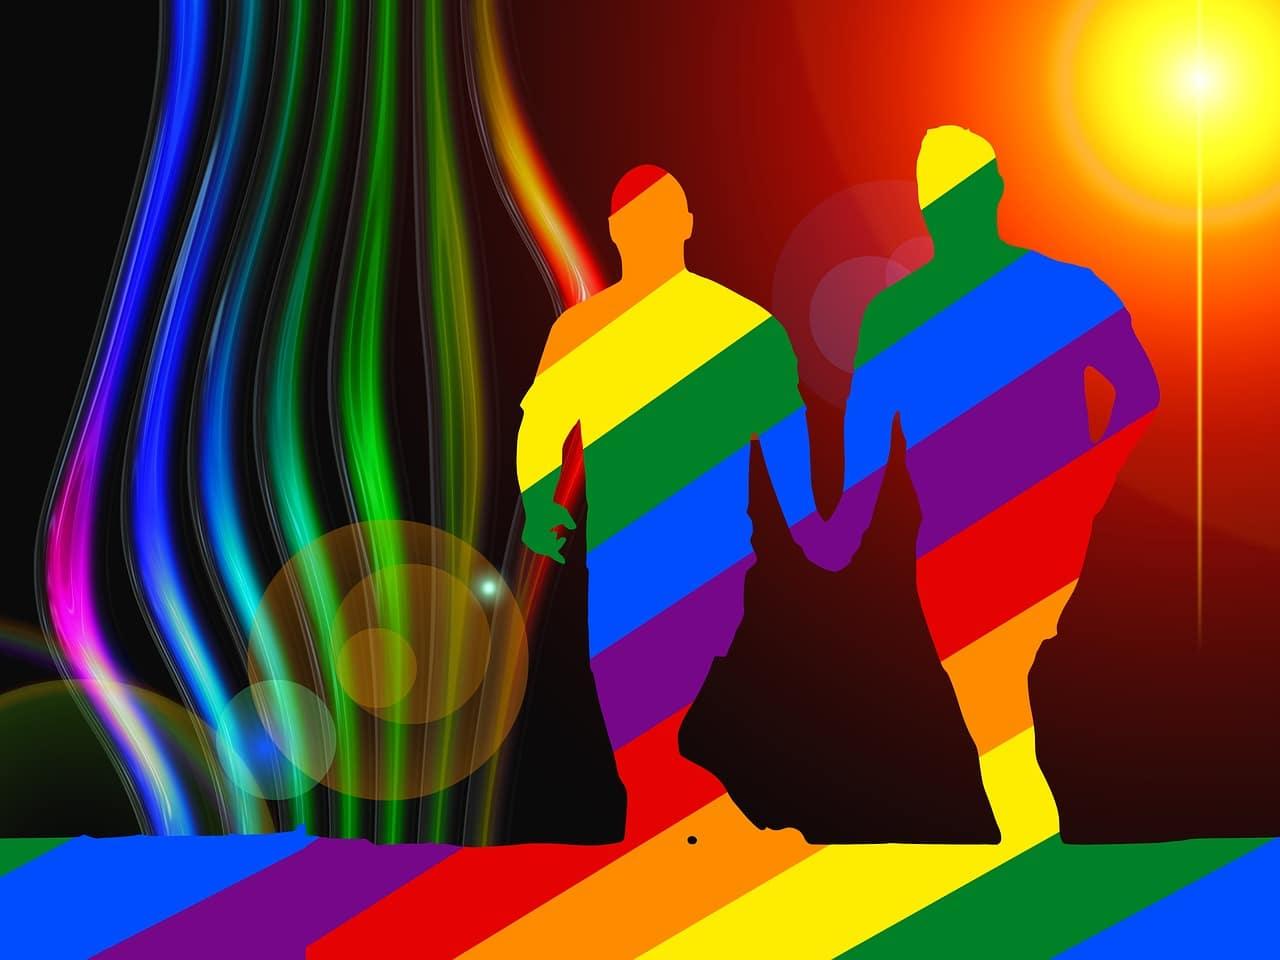 lie detector test in Croydon, homosexuality